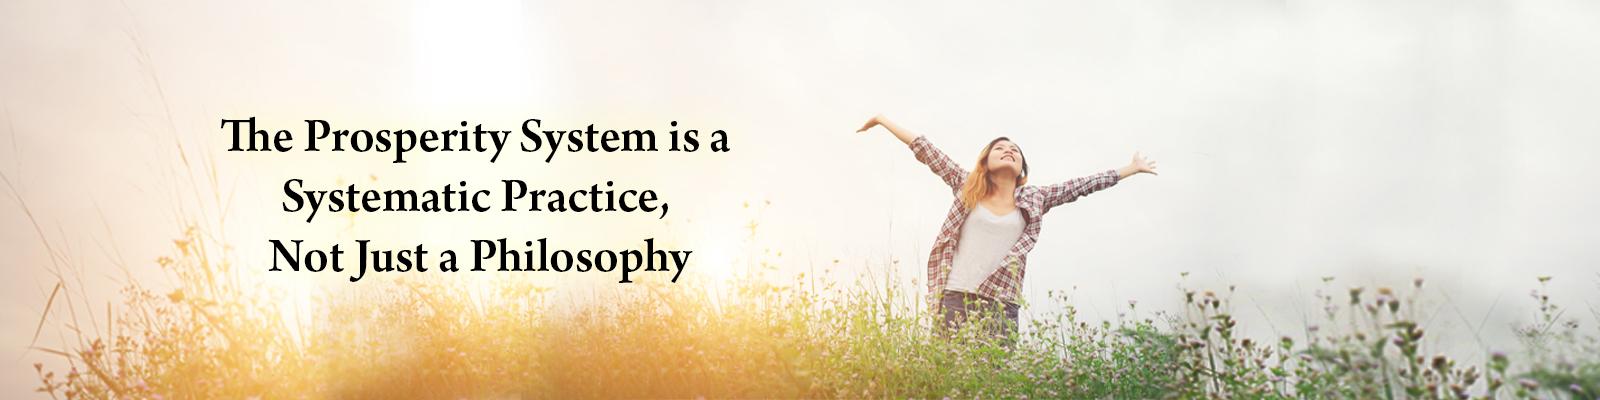 The Prosperity System